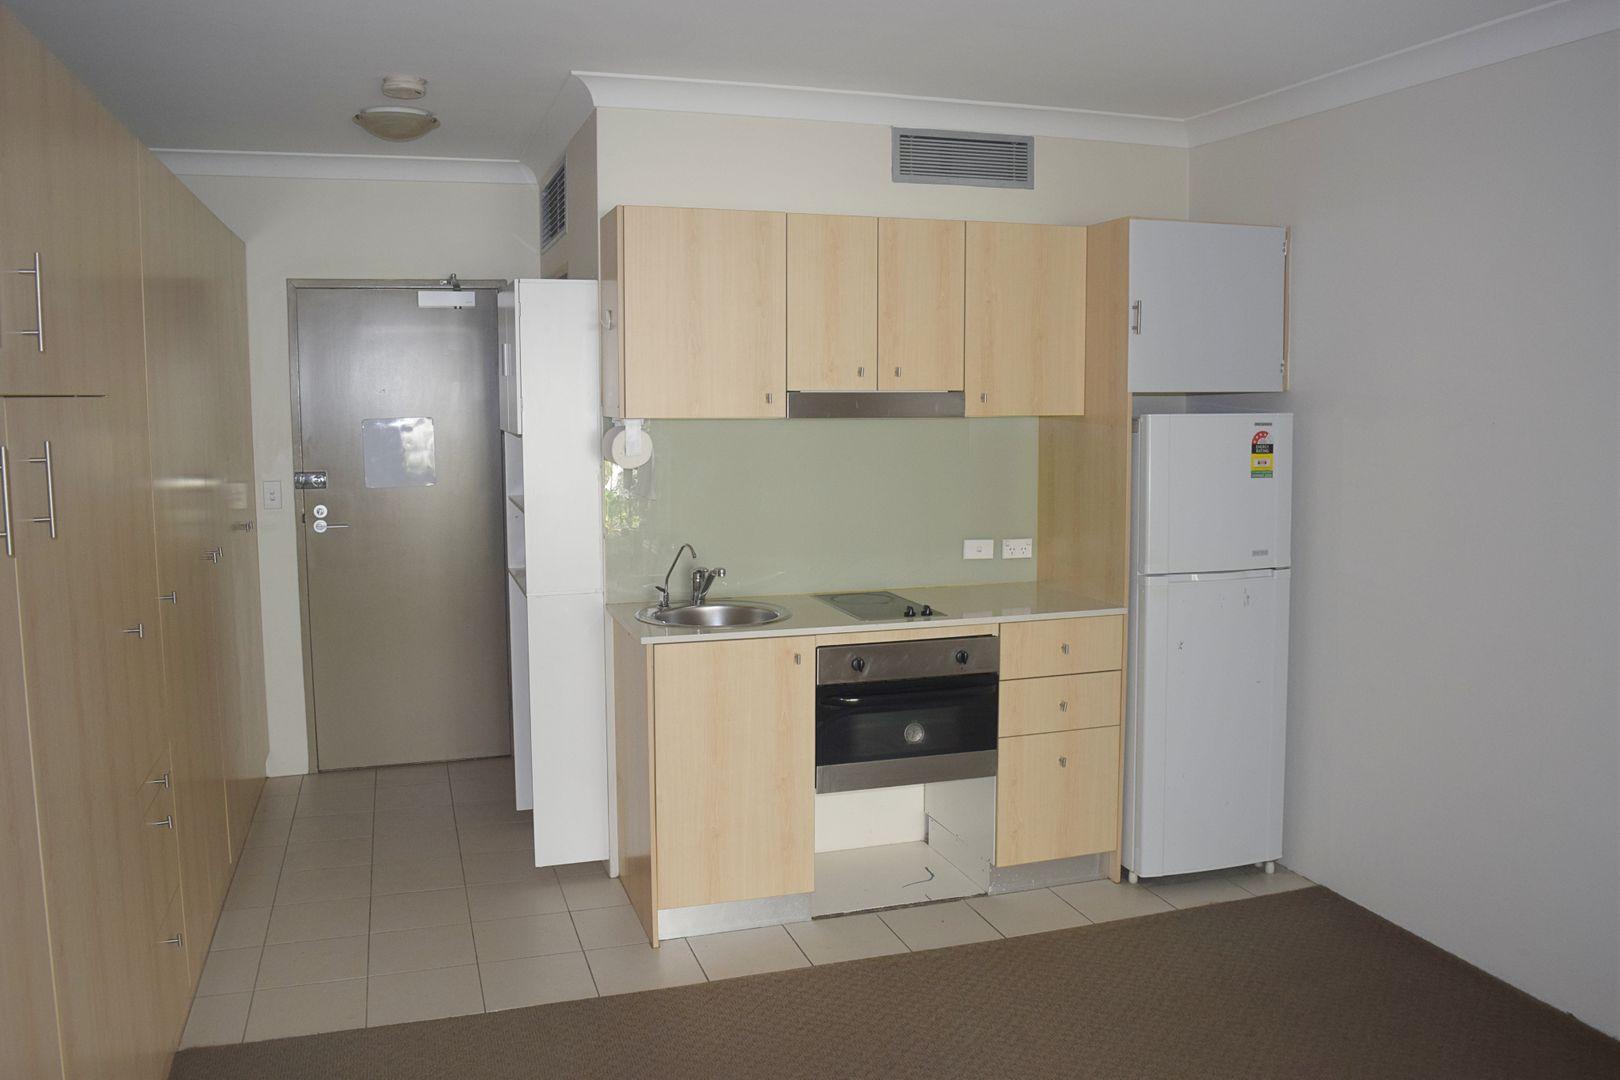 21/165 VICTORIA ROAD, Gladesville NSW 2111, Image 2